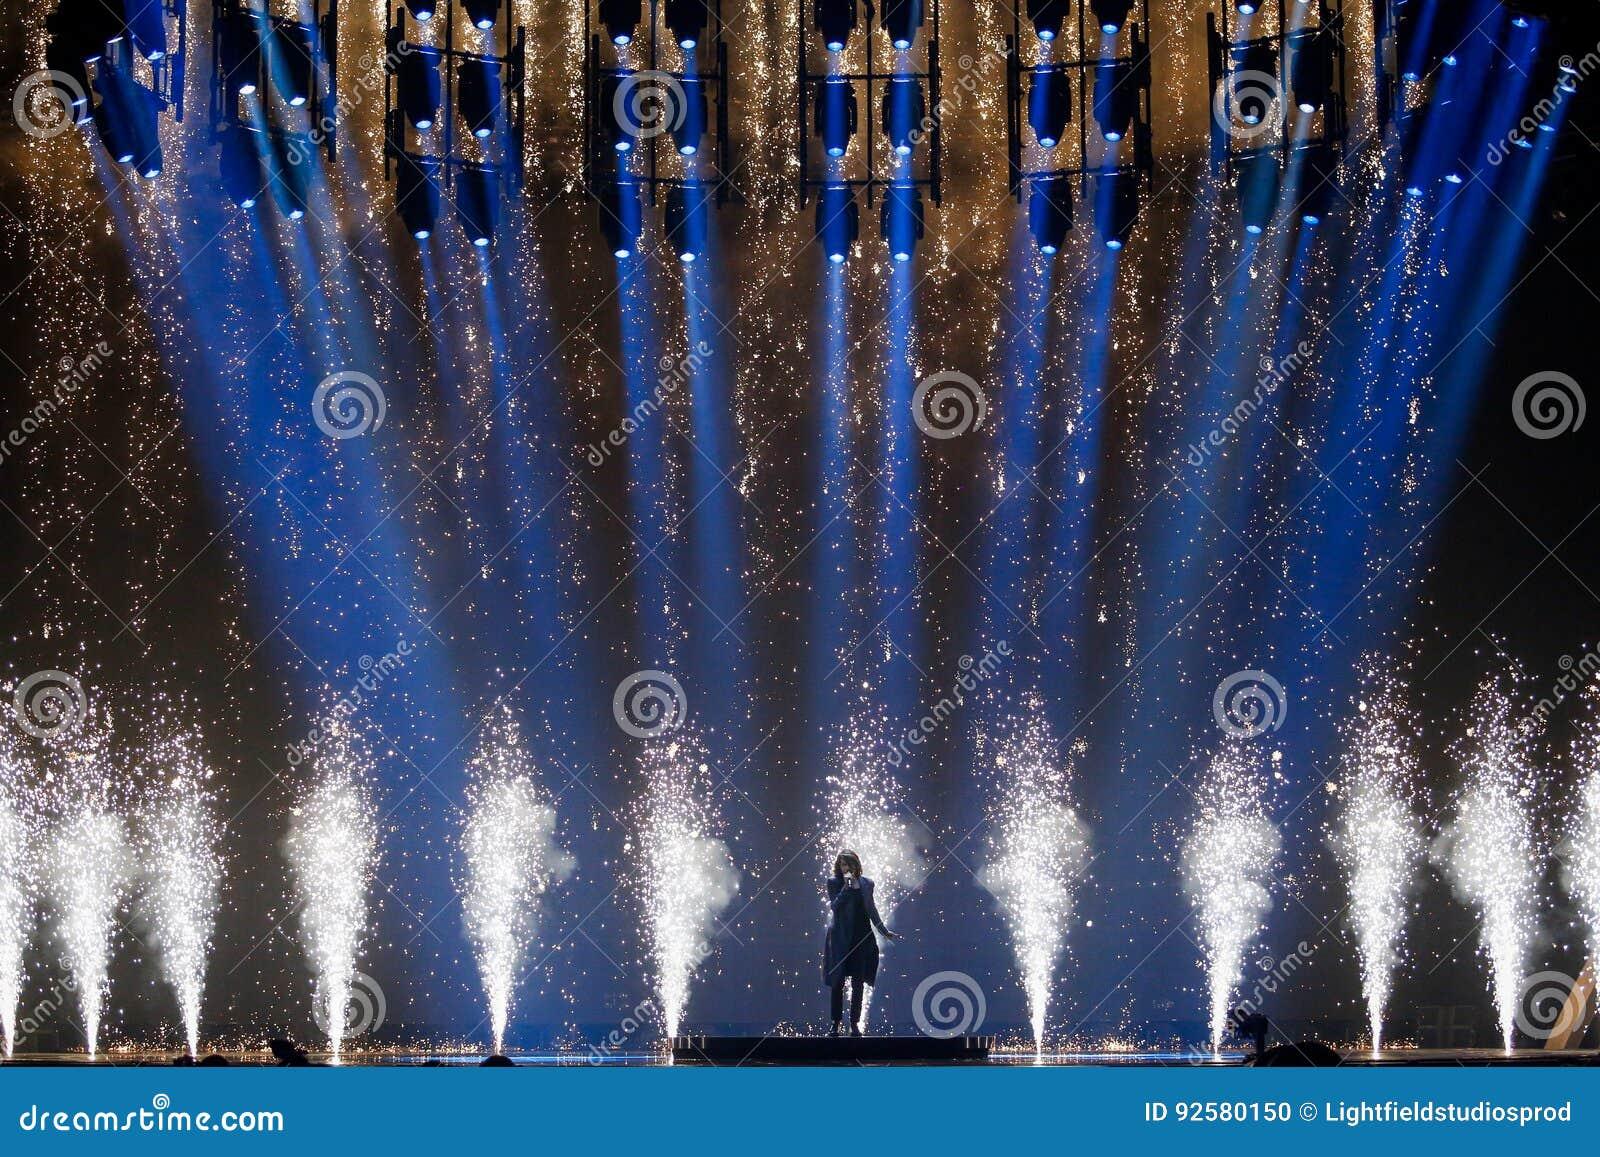 Isaiah Firebrace From Australia Eurovision 2017 Editorial Image Image Of Ukrainian Kyiv 92580150